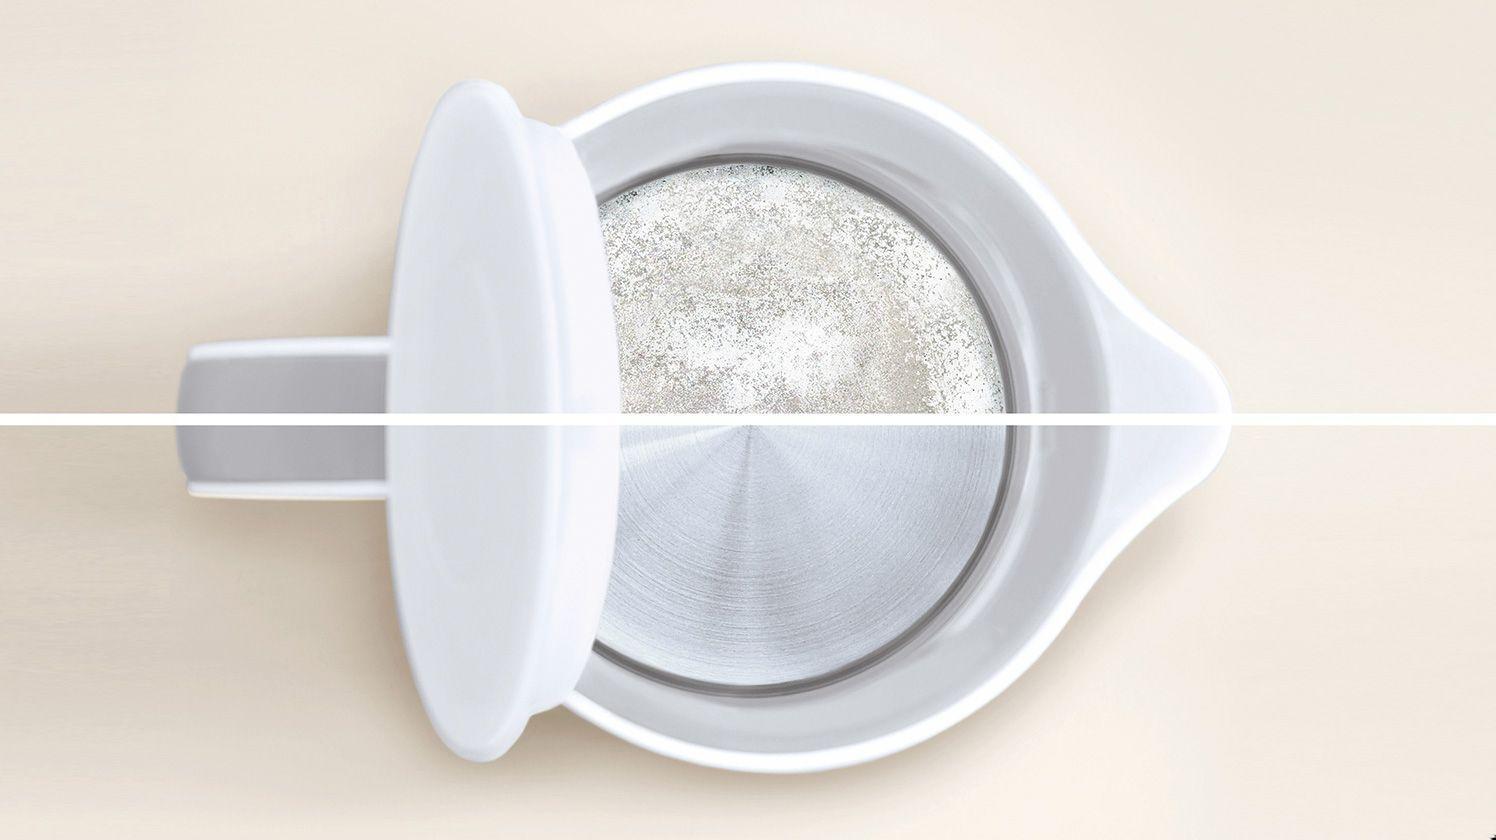 BRITA filters en patronen MAXTRA+ smaak heet